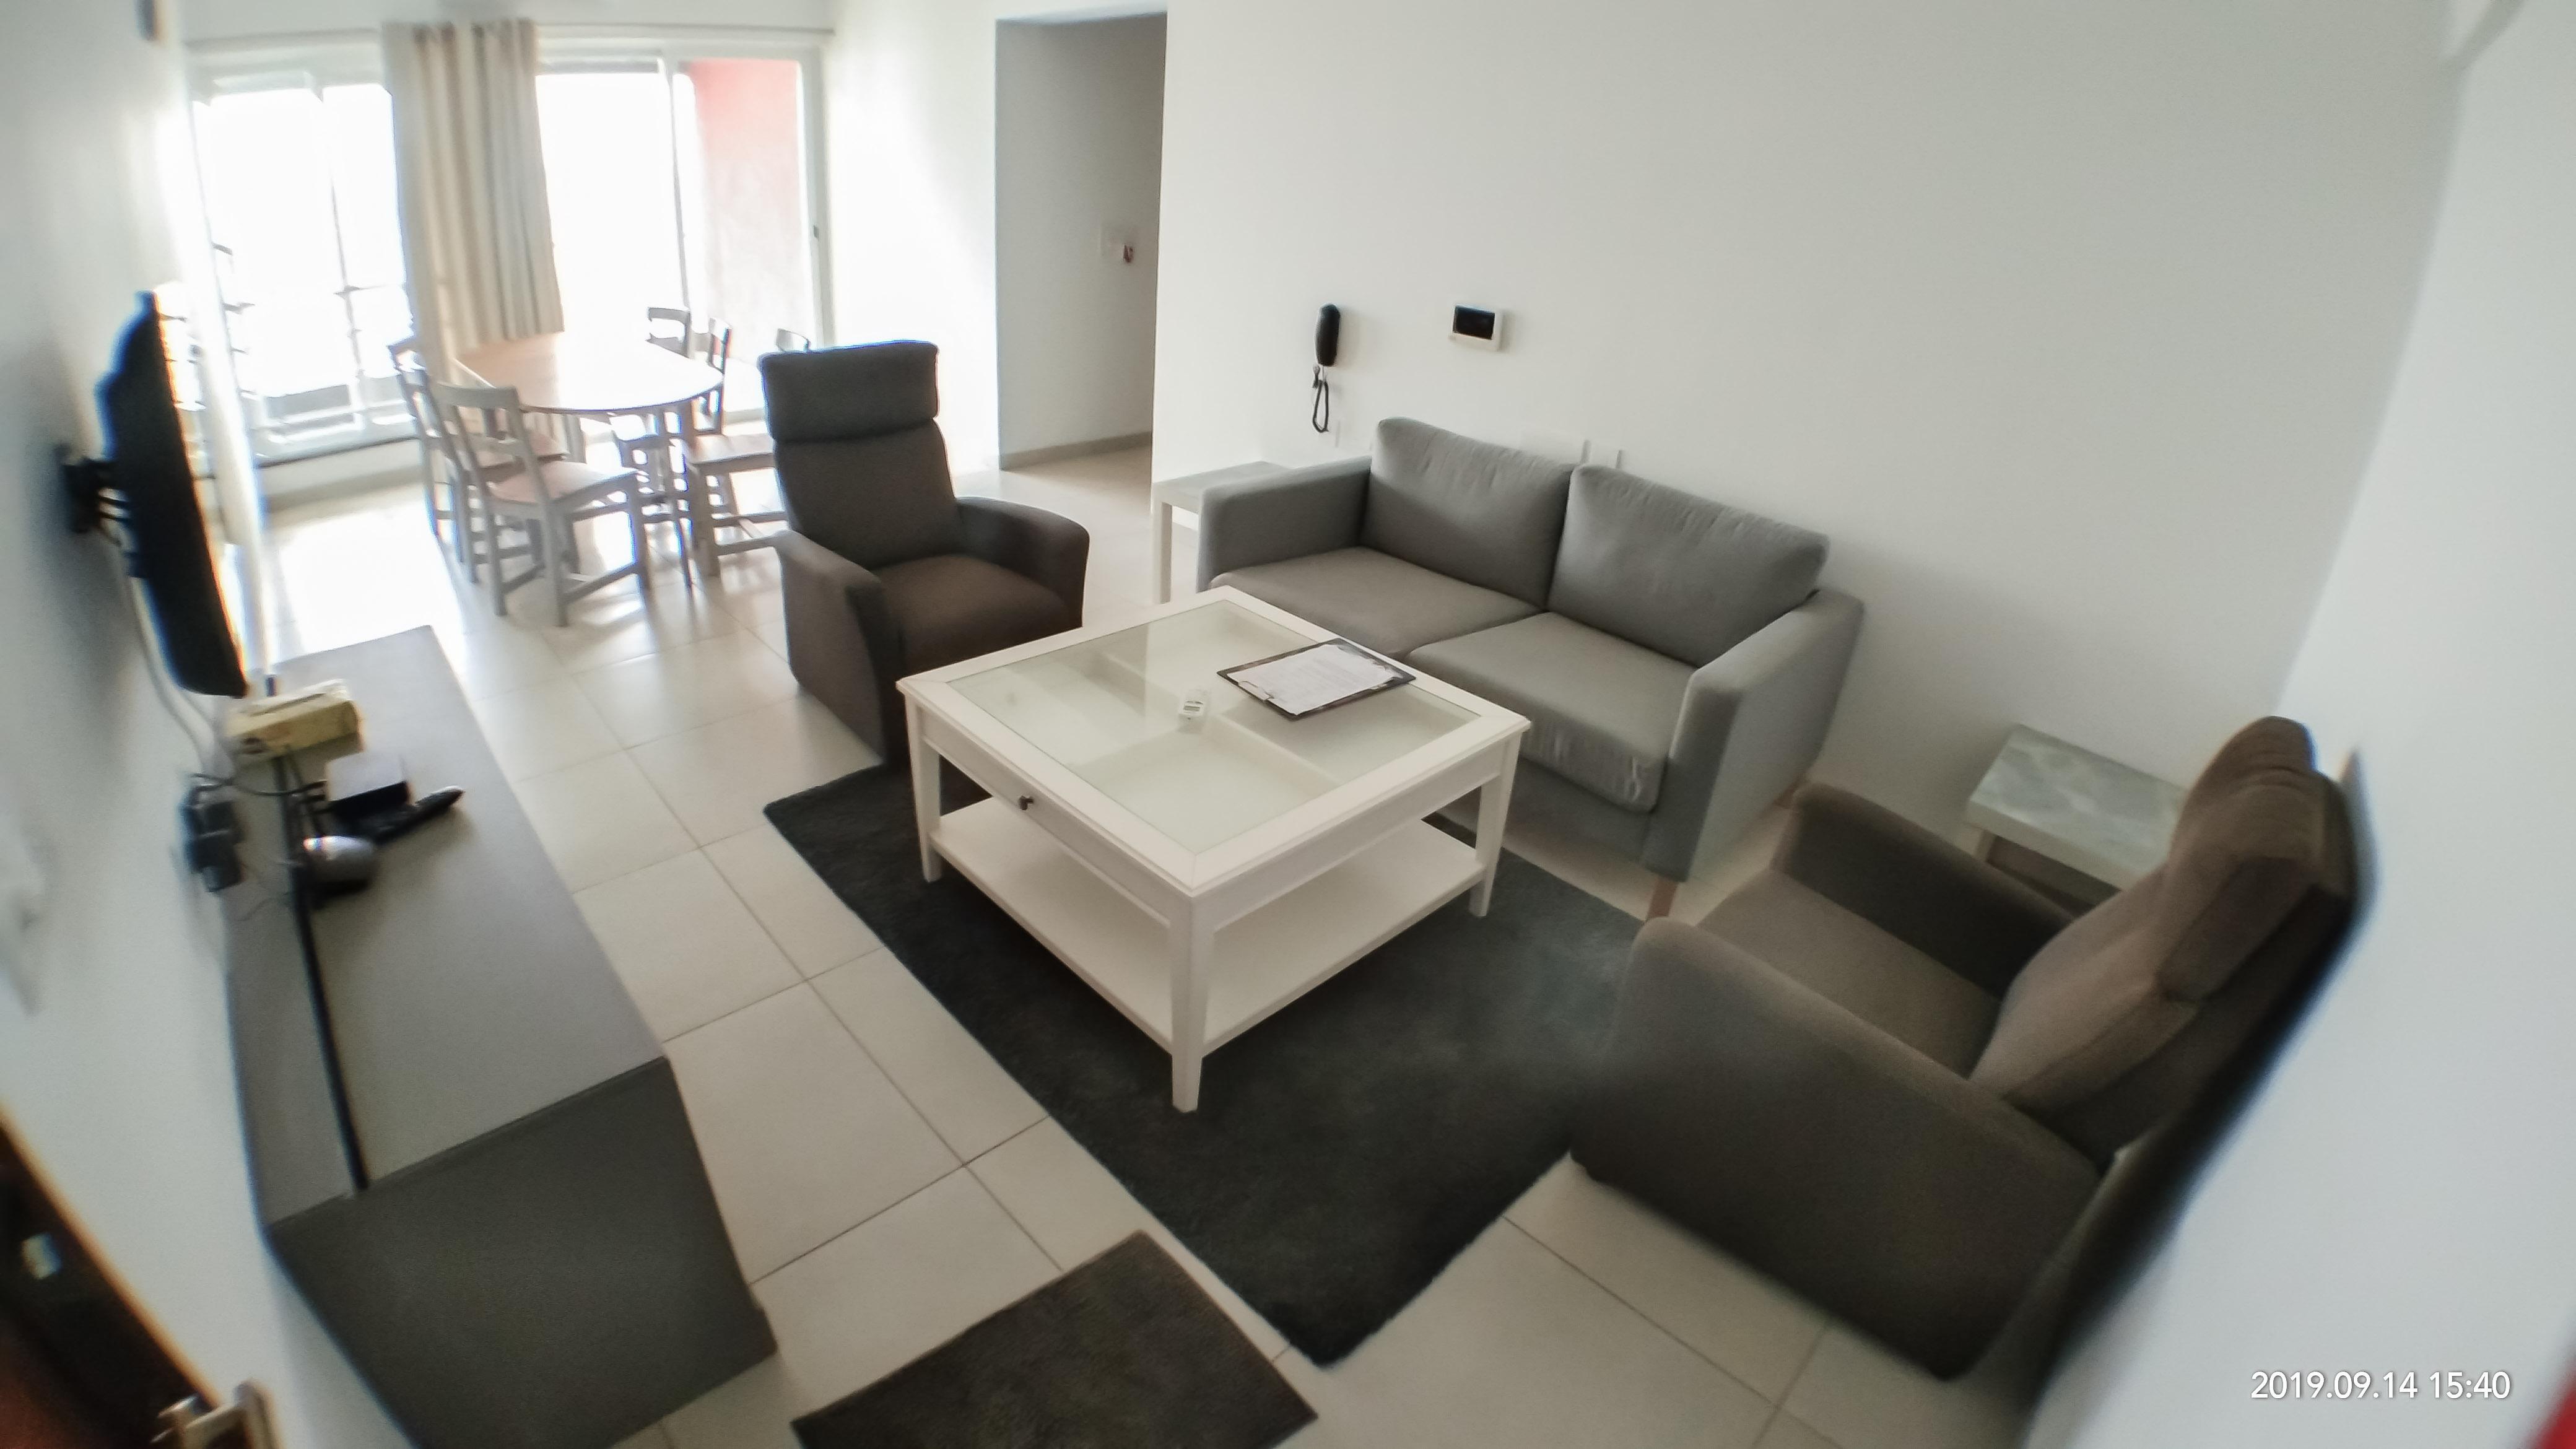 Living cum dining room at Gagan NuLife (Representative image)